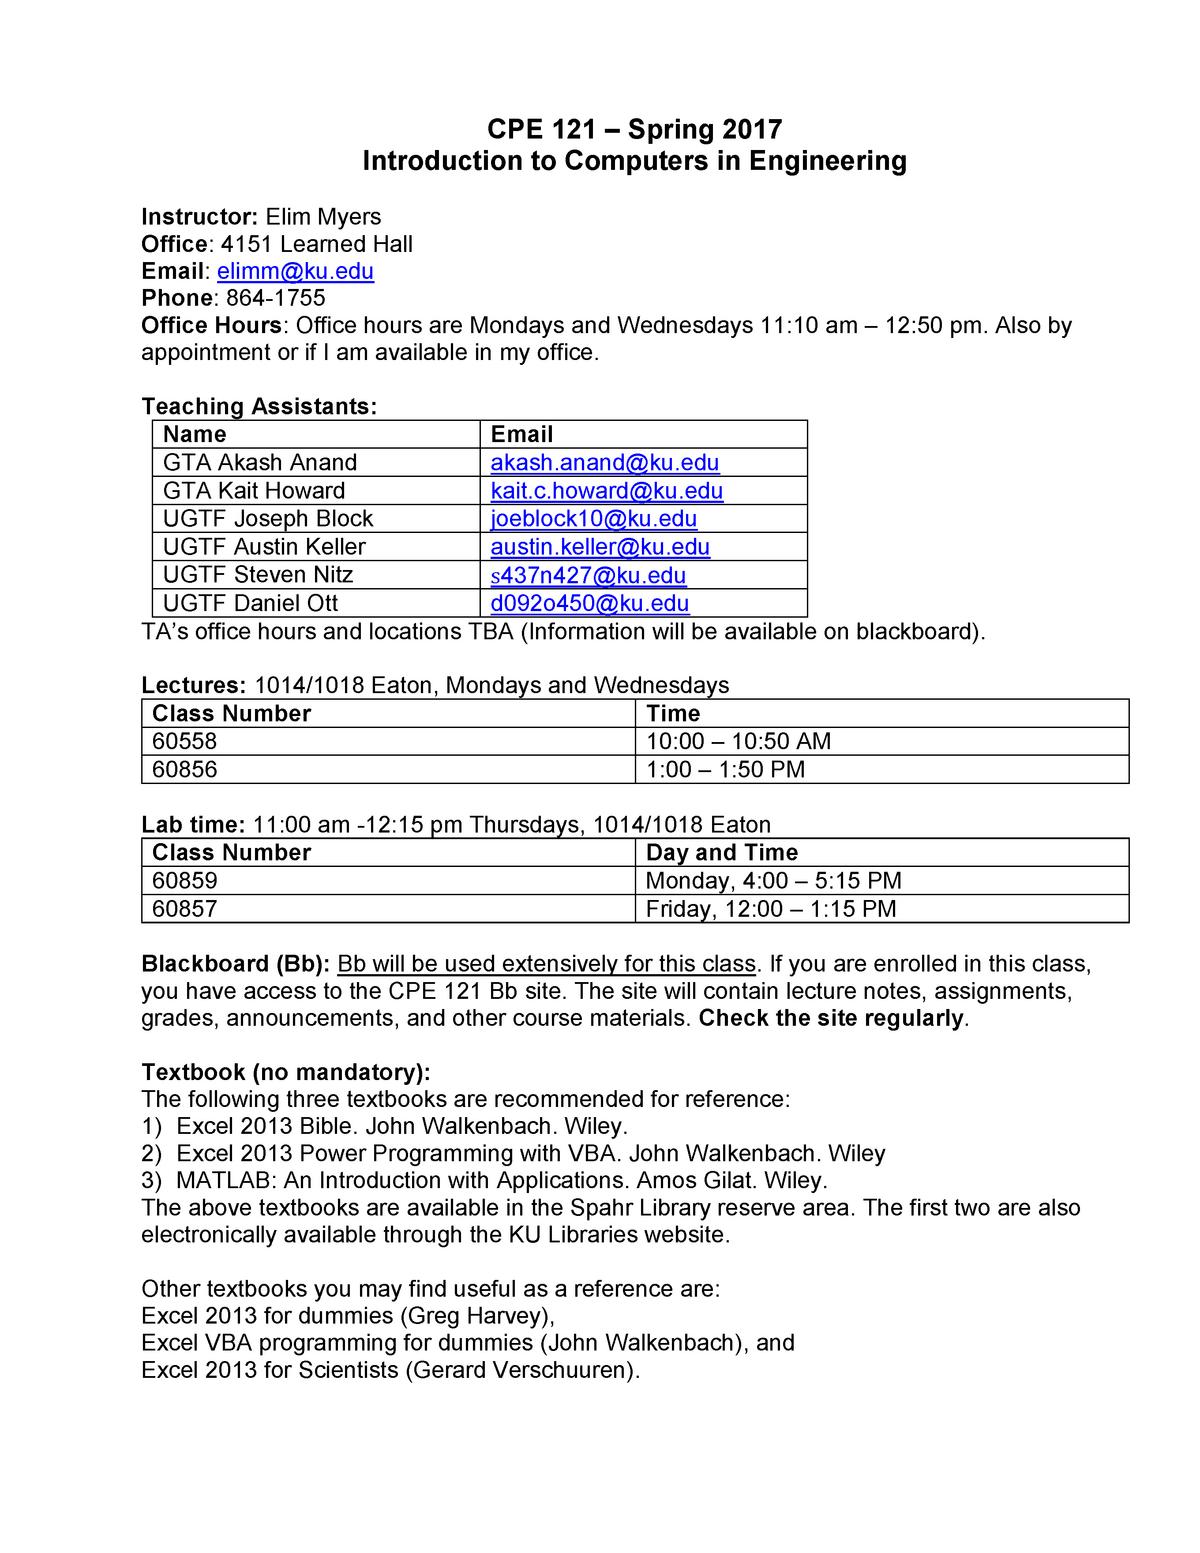 CPE121SP17 Syllabus - C&PE 121: Intro Computers In